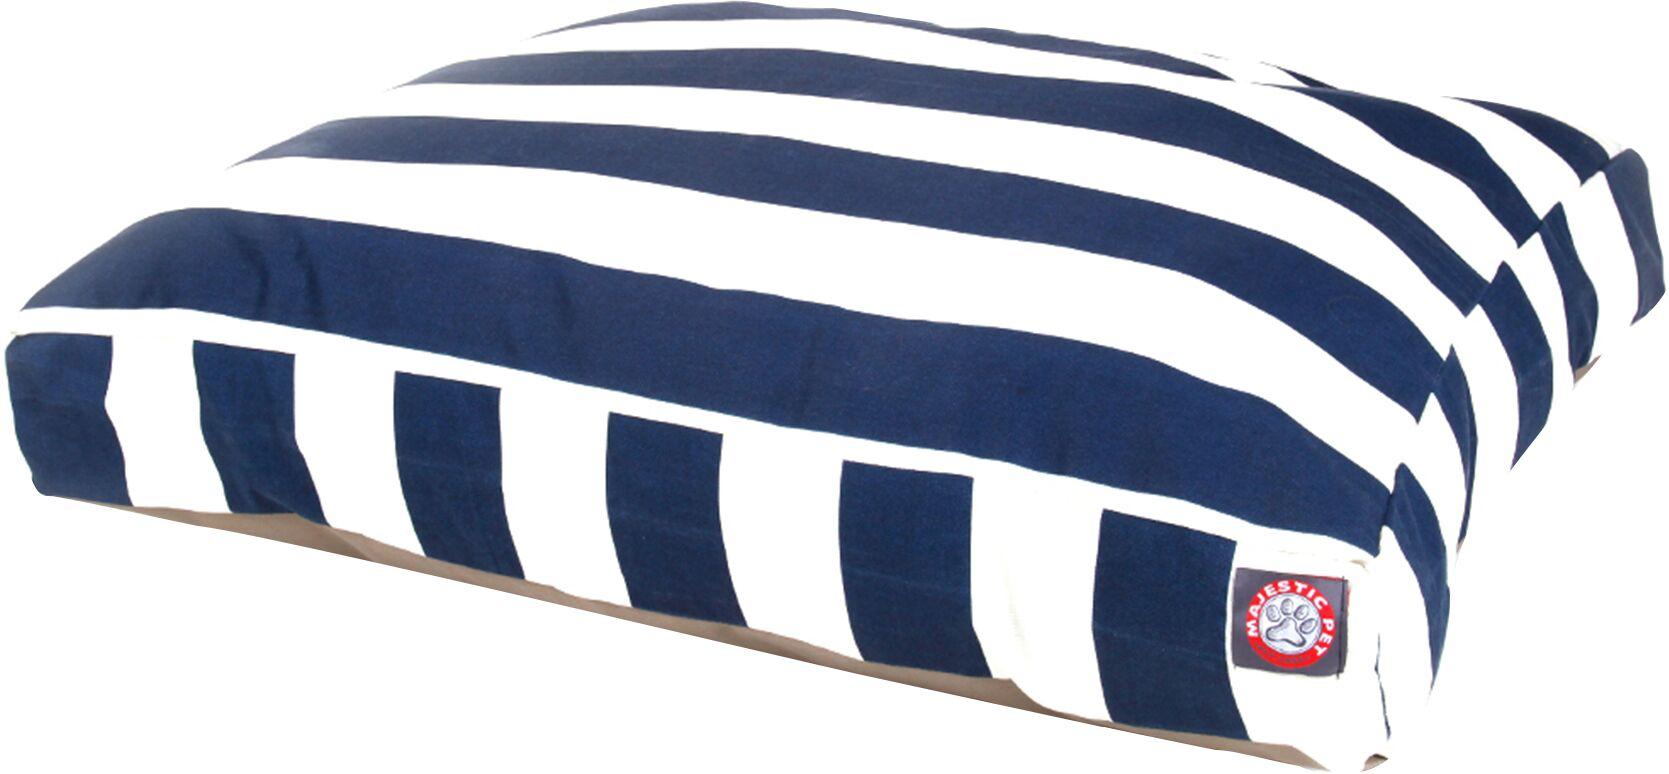 Vertical Stripe Pillow Dog Bed Color: Navy Blue, Size: Large (50